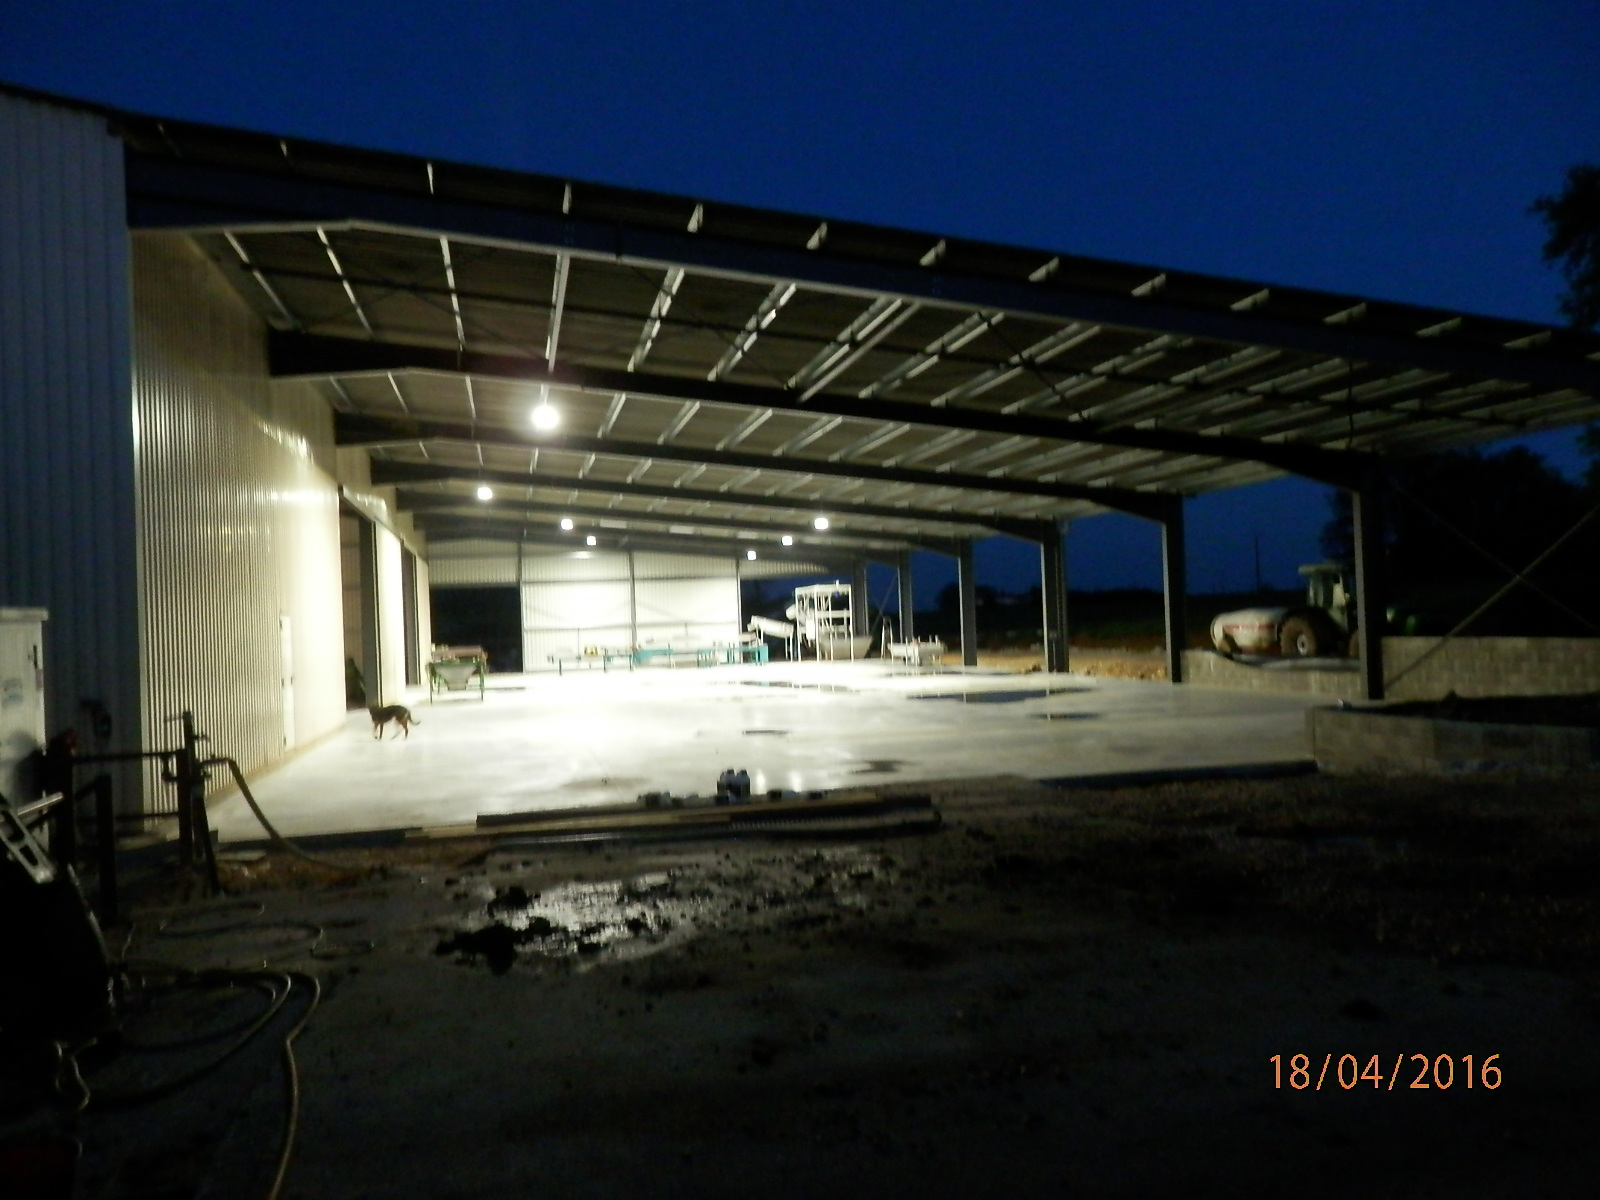 eclairage hangar agricole eclairage industriel led atex. Black Bedroom Furniture Sets. Home Design Ideas